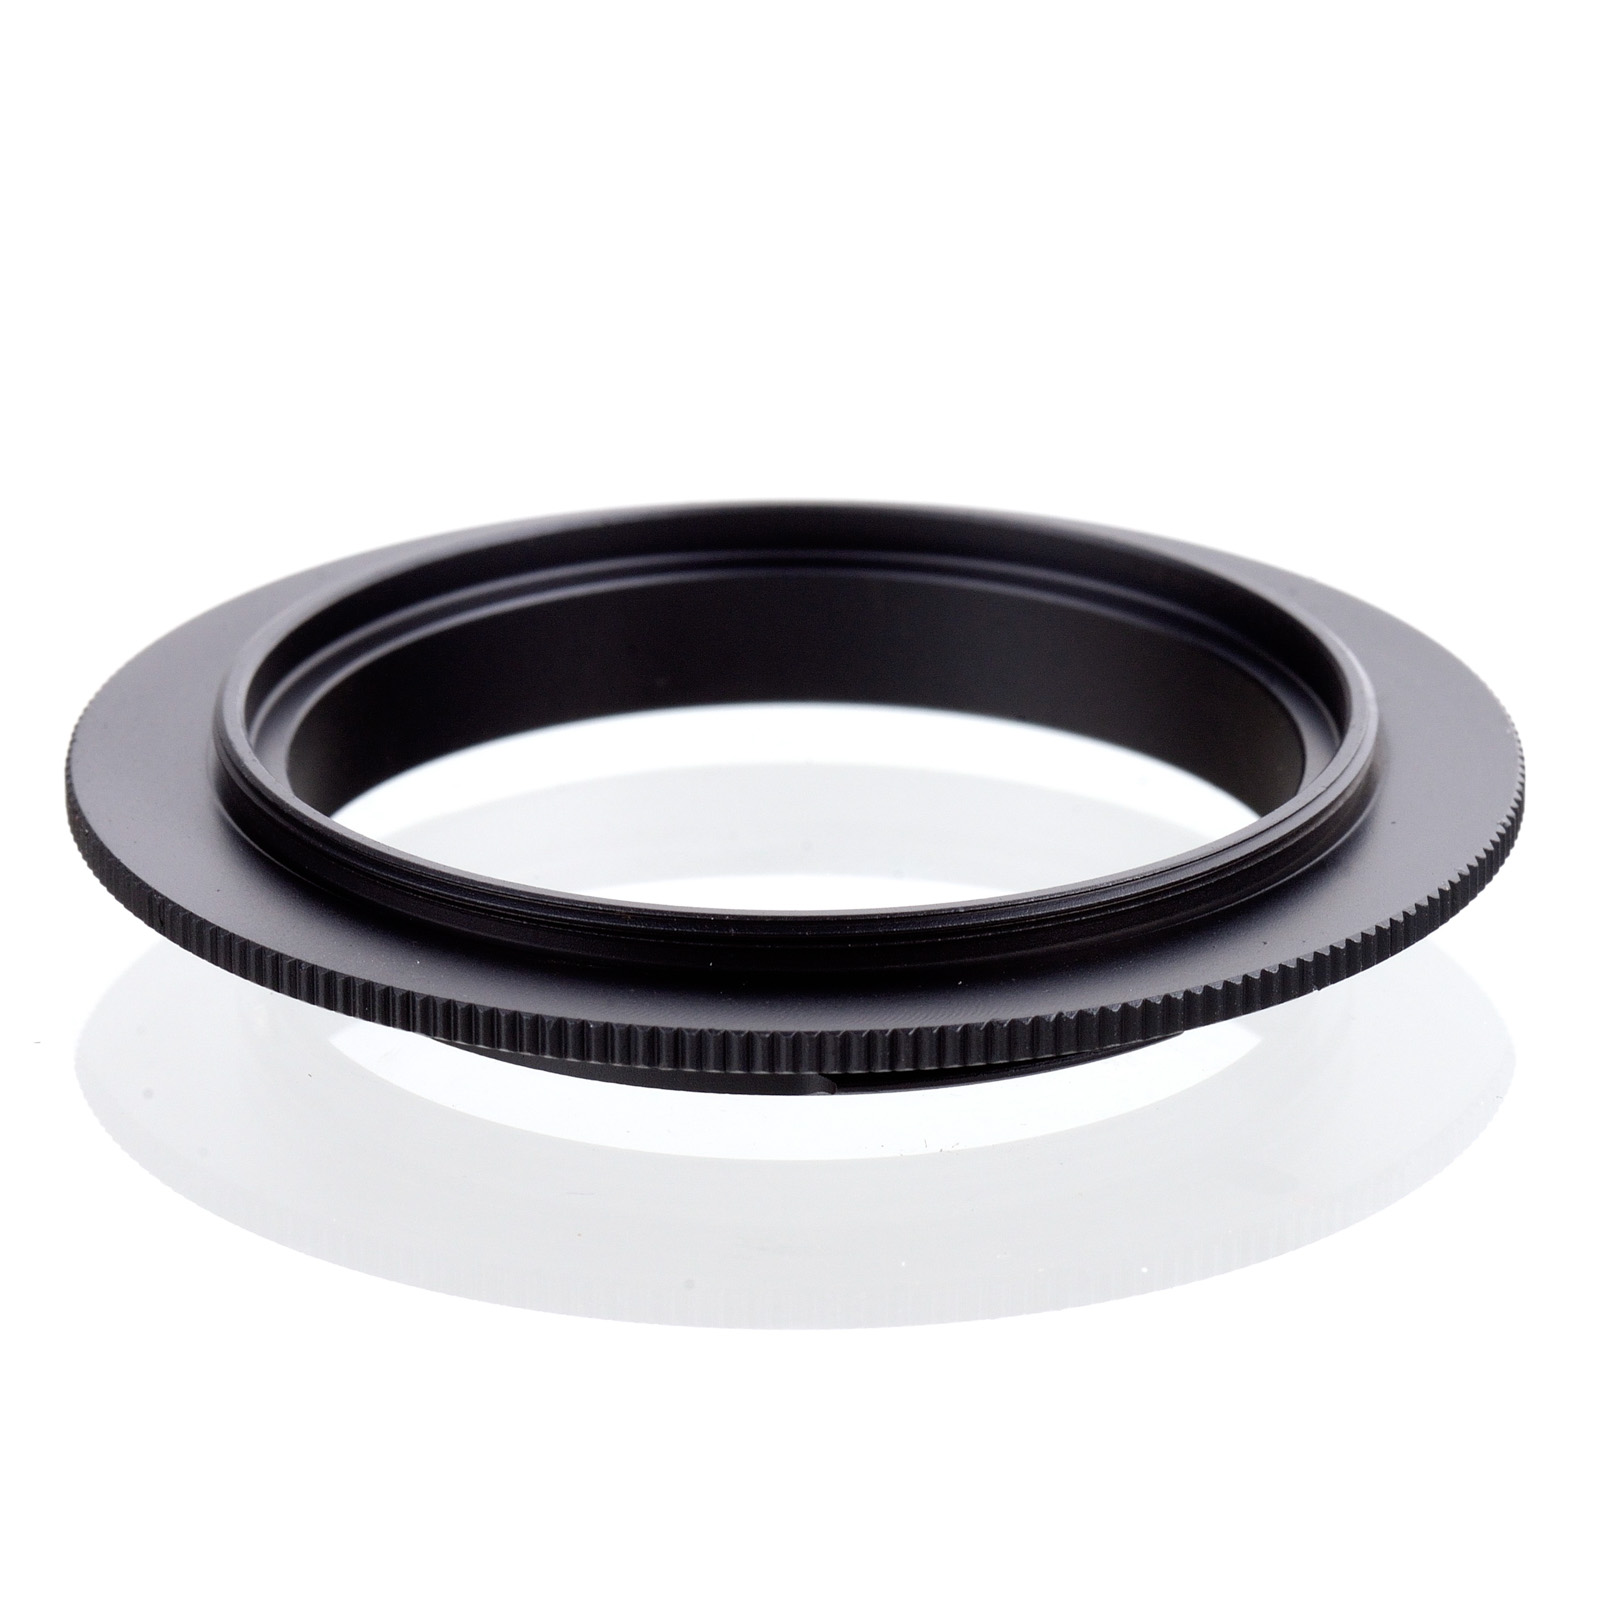 AF 49mm Macro Reverse Adapter Ring For Sony Alpha Minolta MA Mount DSLR